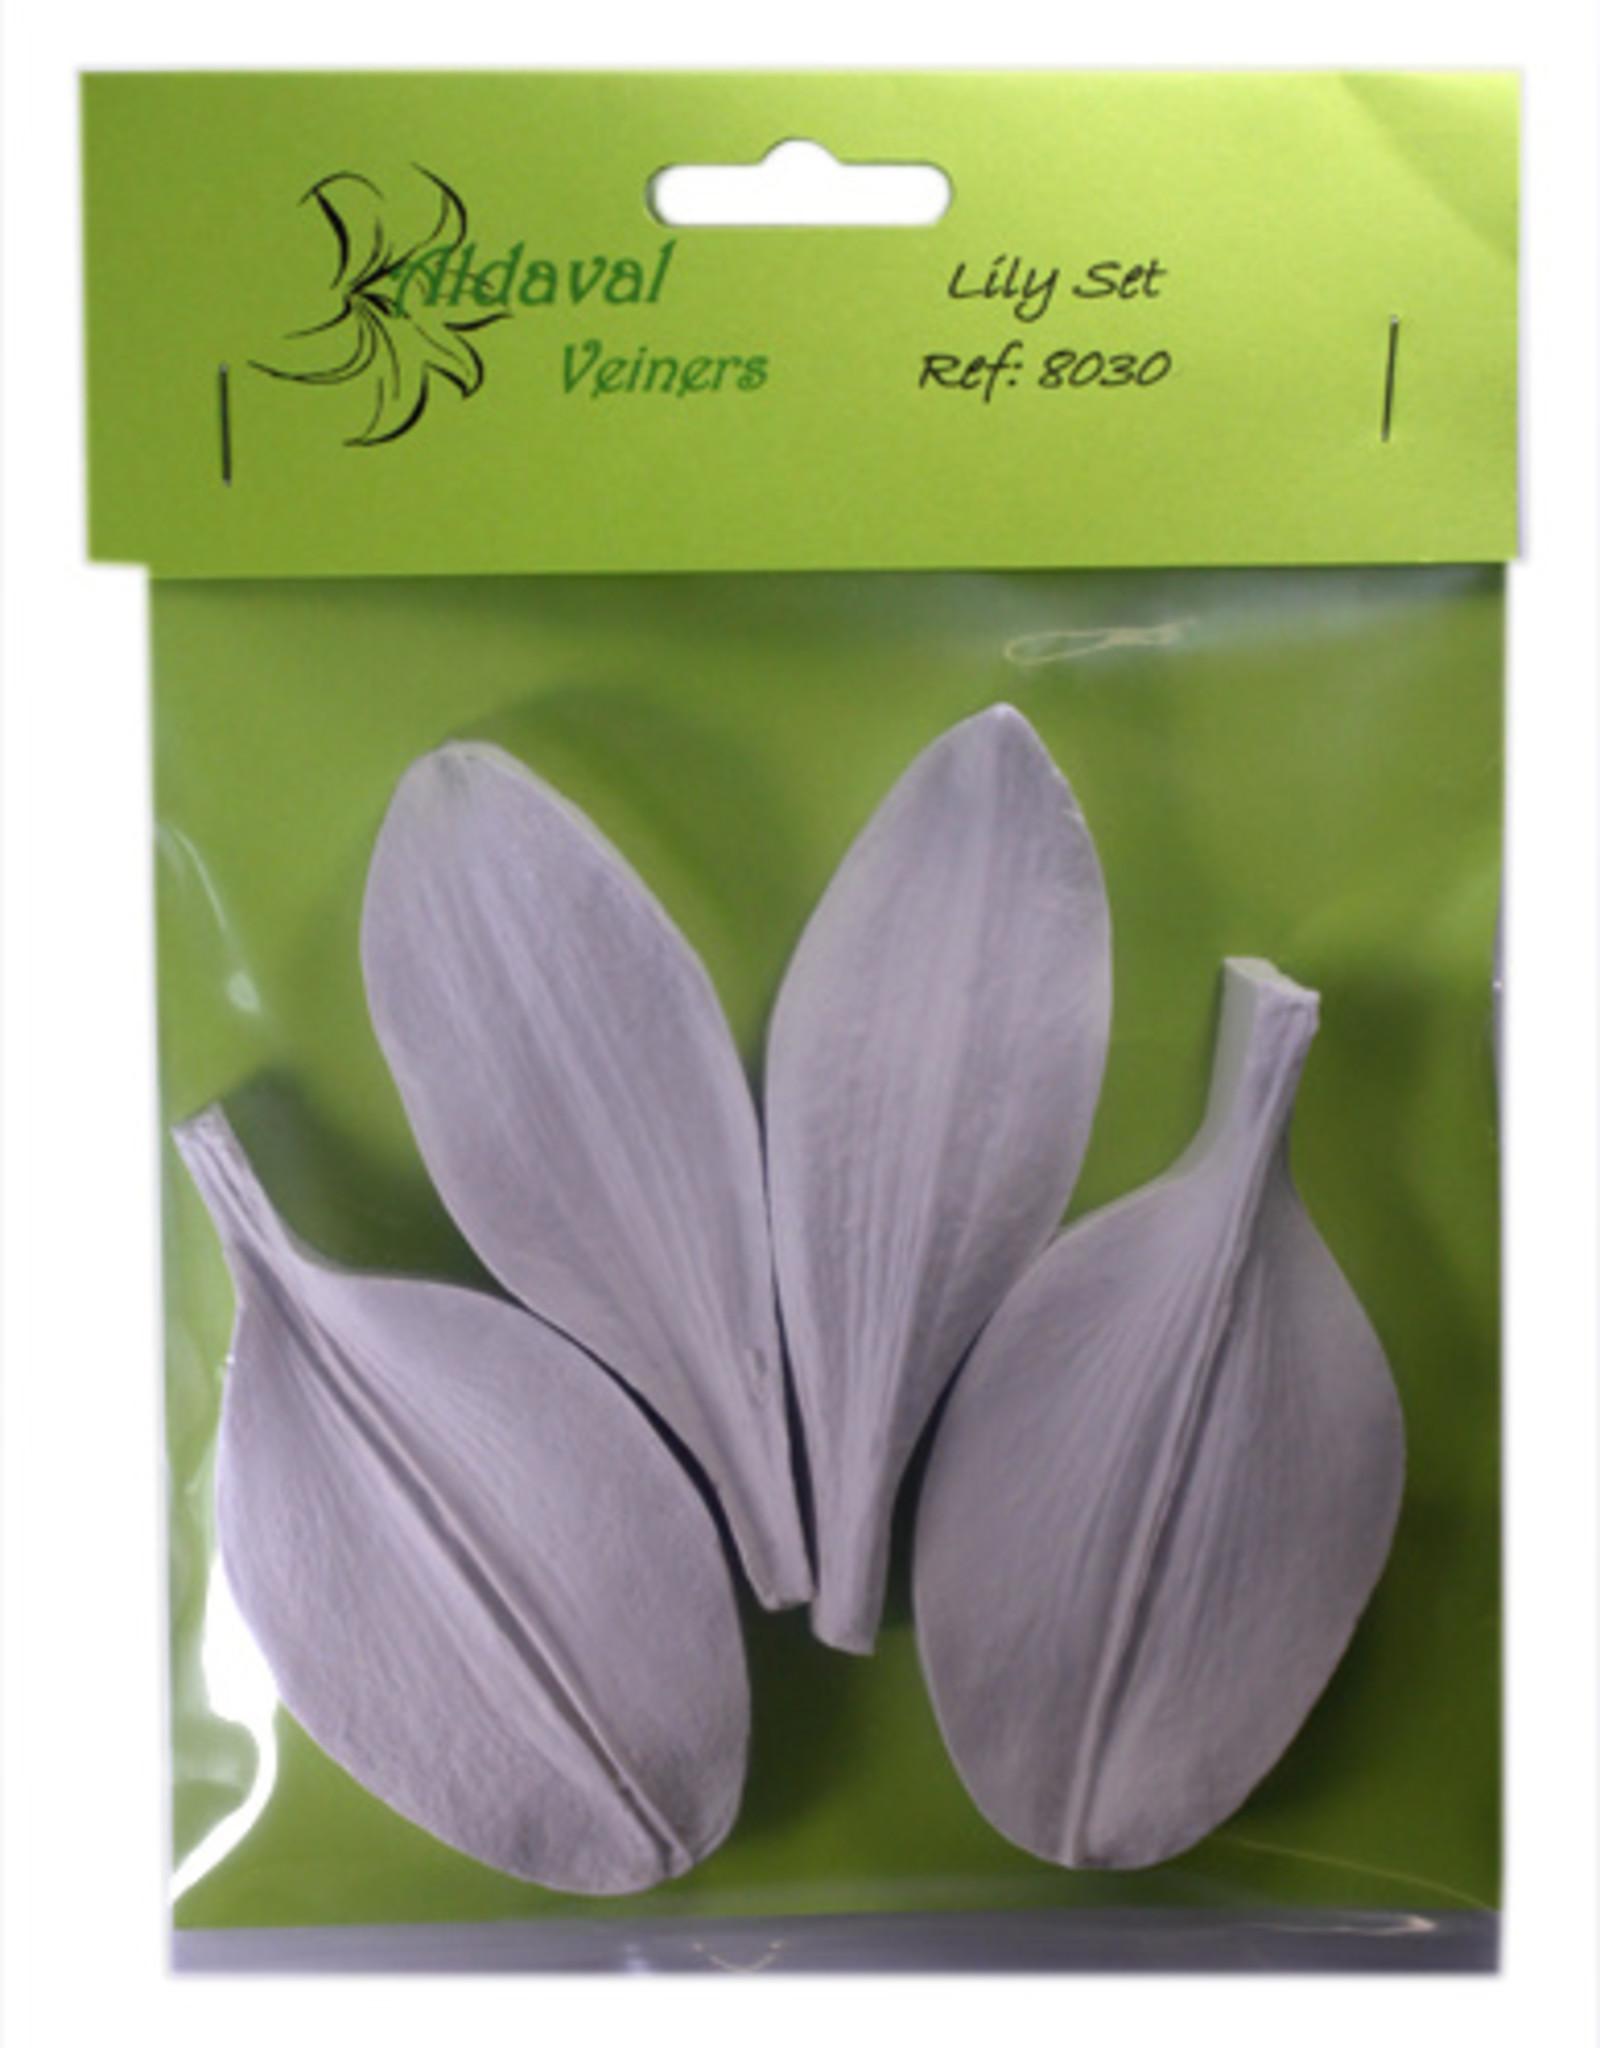 Aldaval Veiners Aldaval Lily petal Veiner Set  3.5 x 9.7cm and 4.9 x 9.4cm